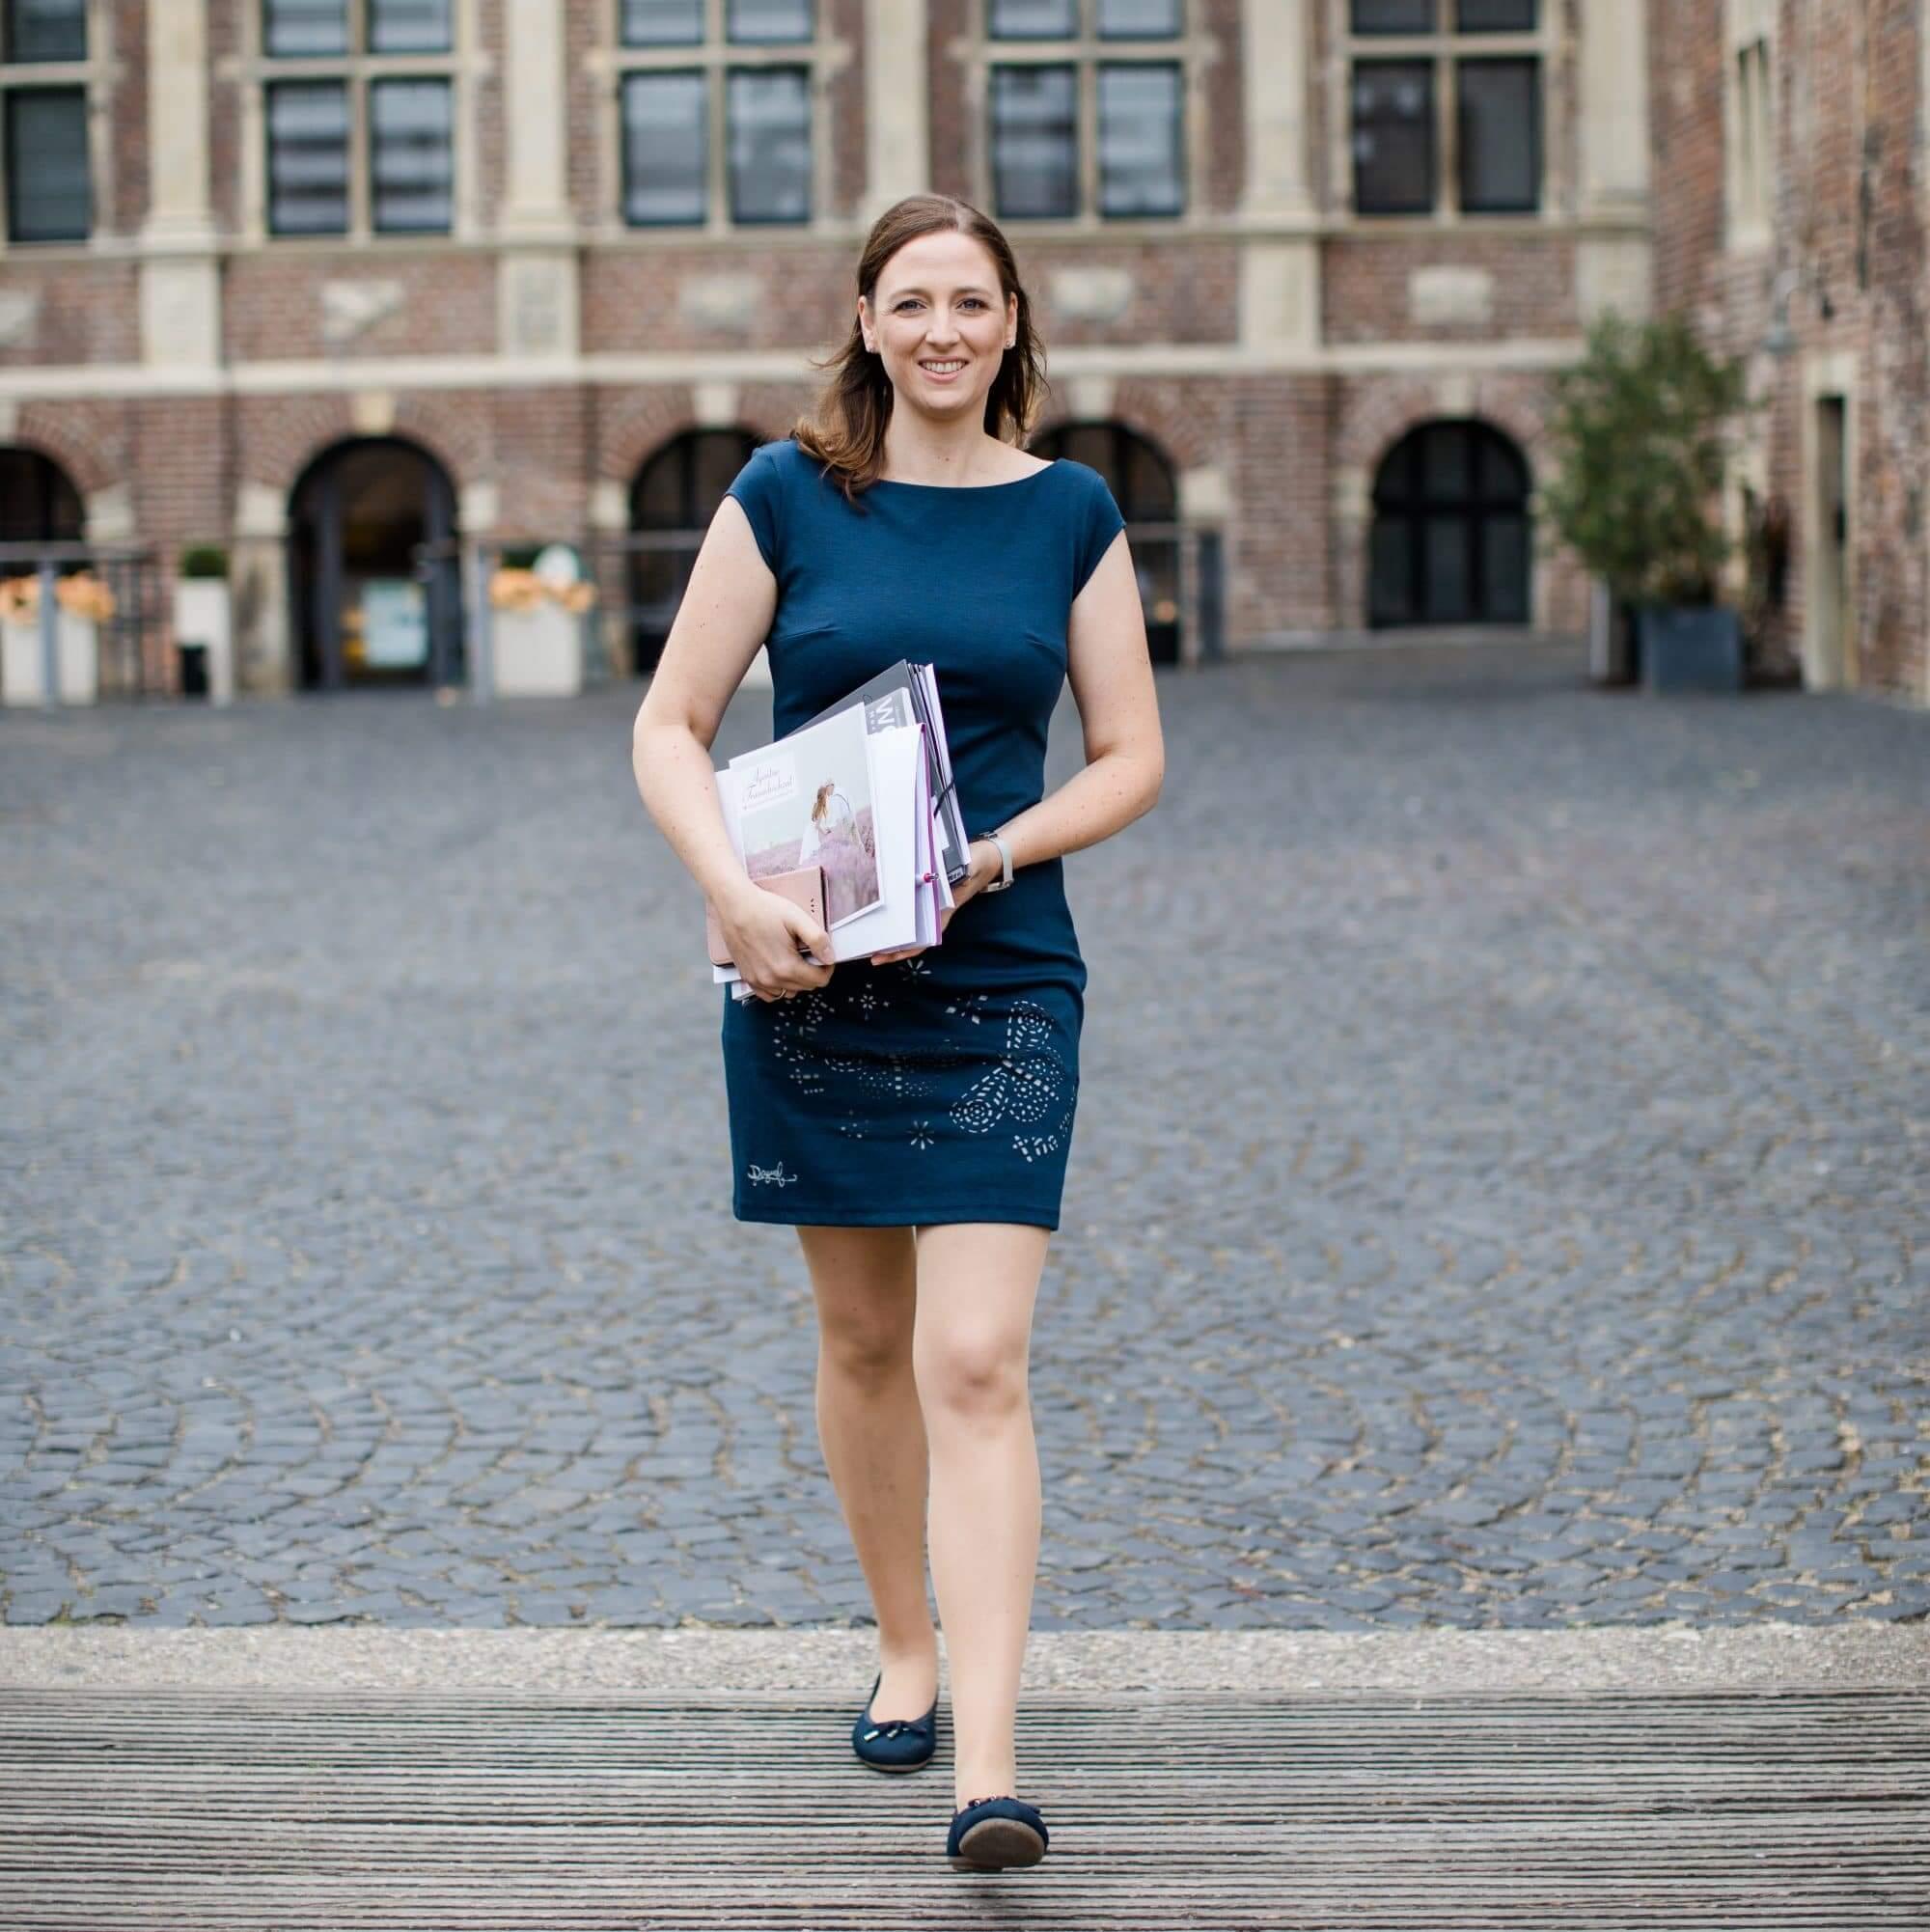 Simone-Maiwald-Foto-About1